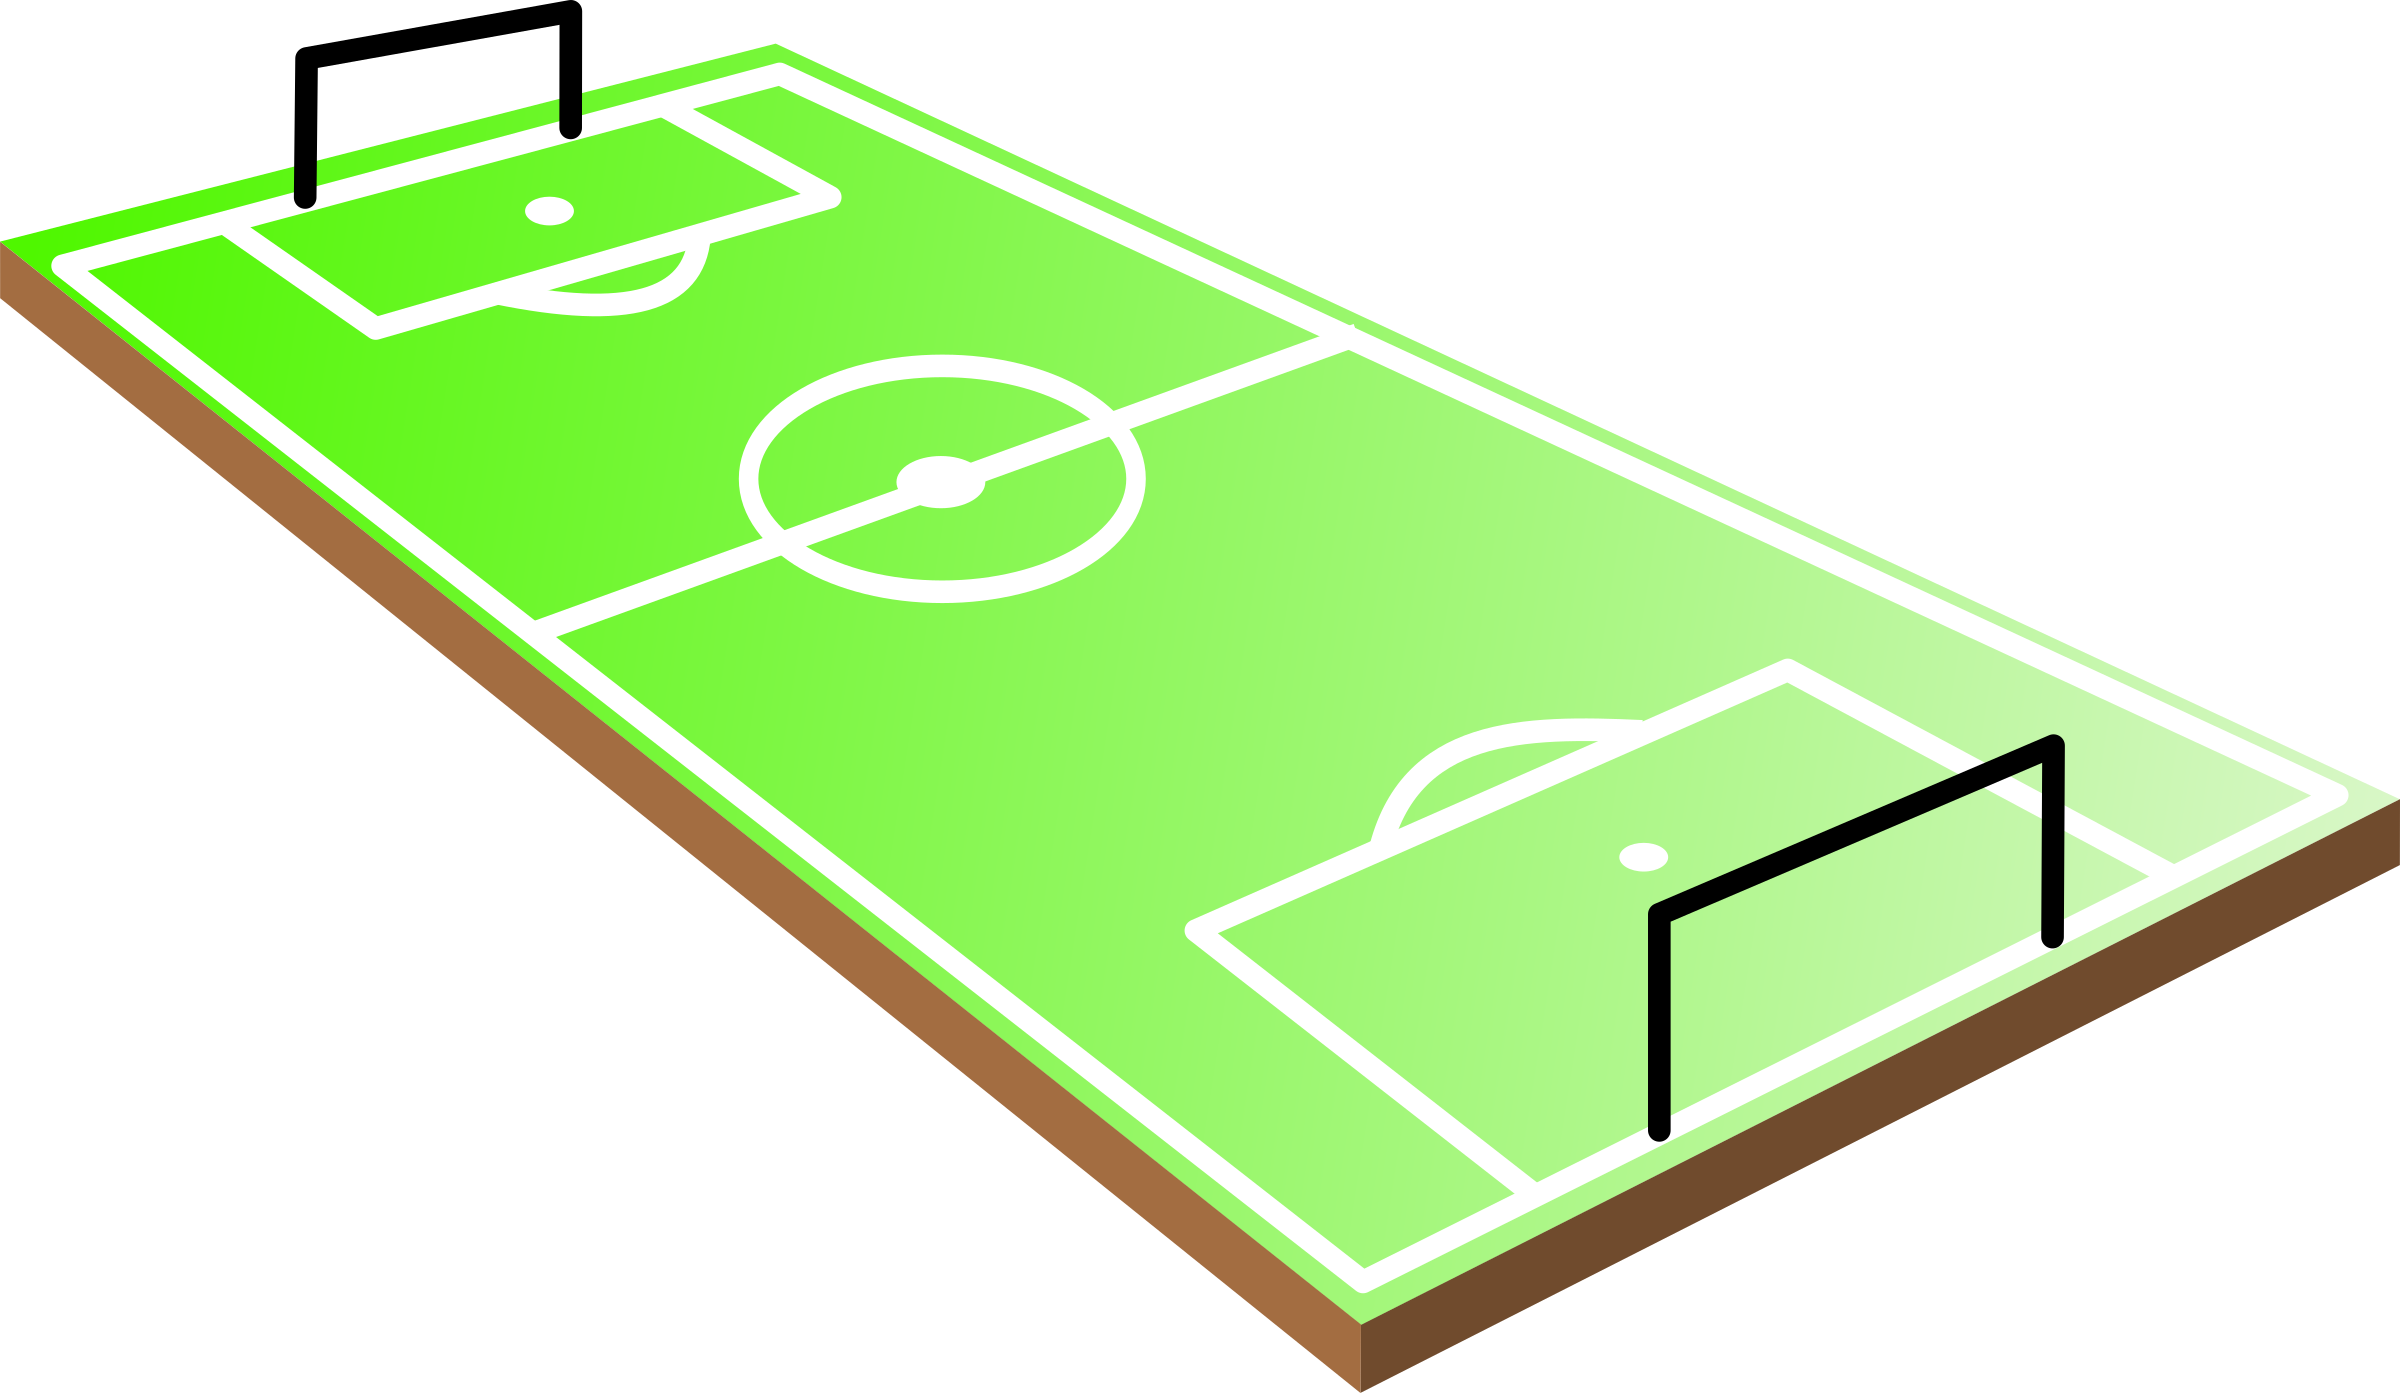 2400x1393 Football Field Clip Art 4